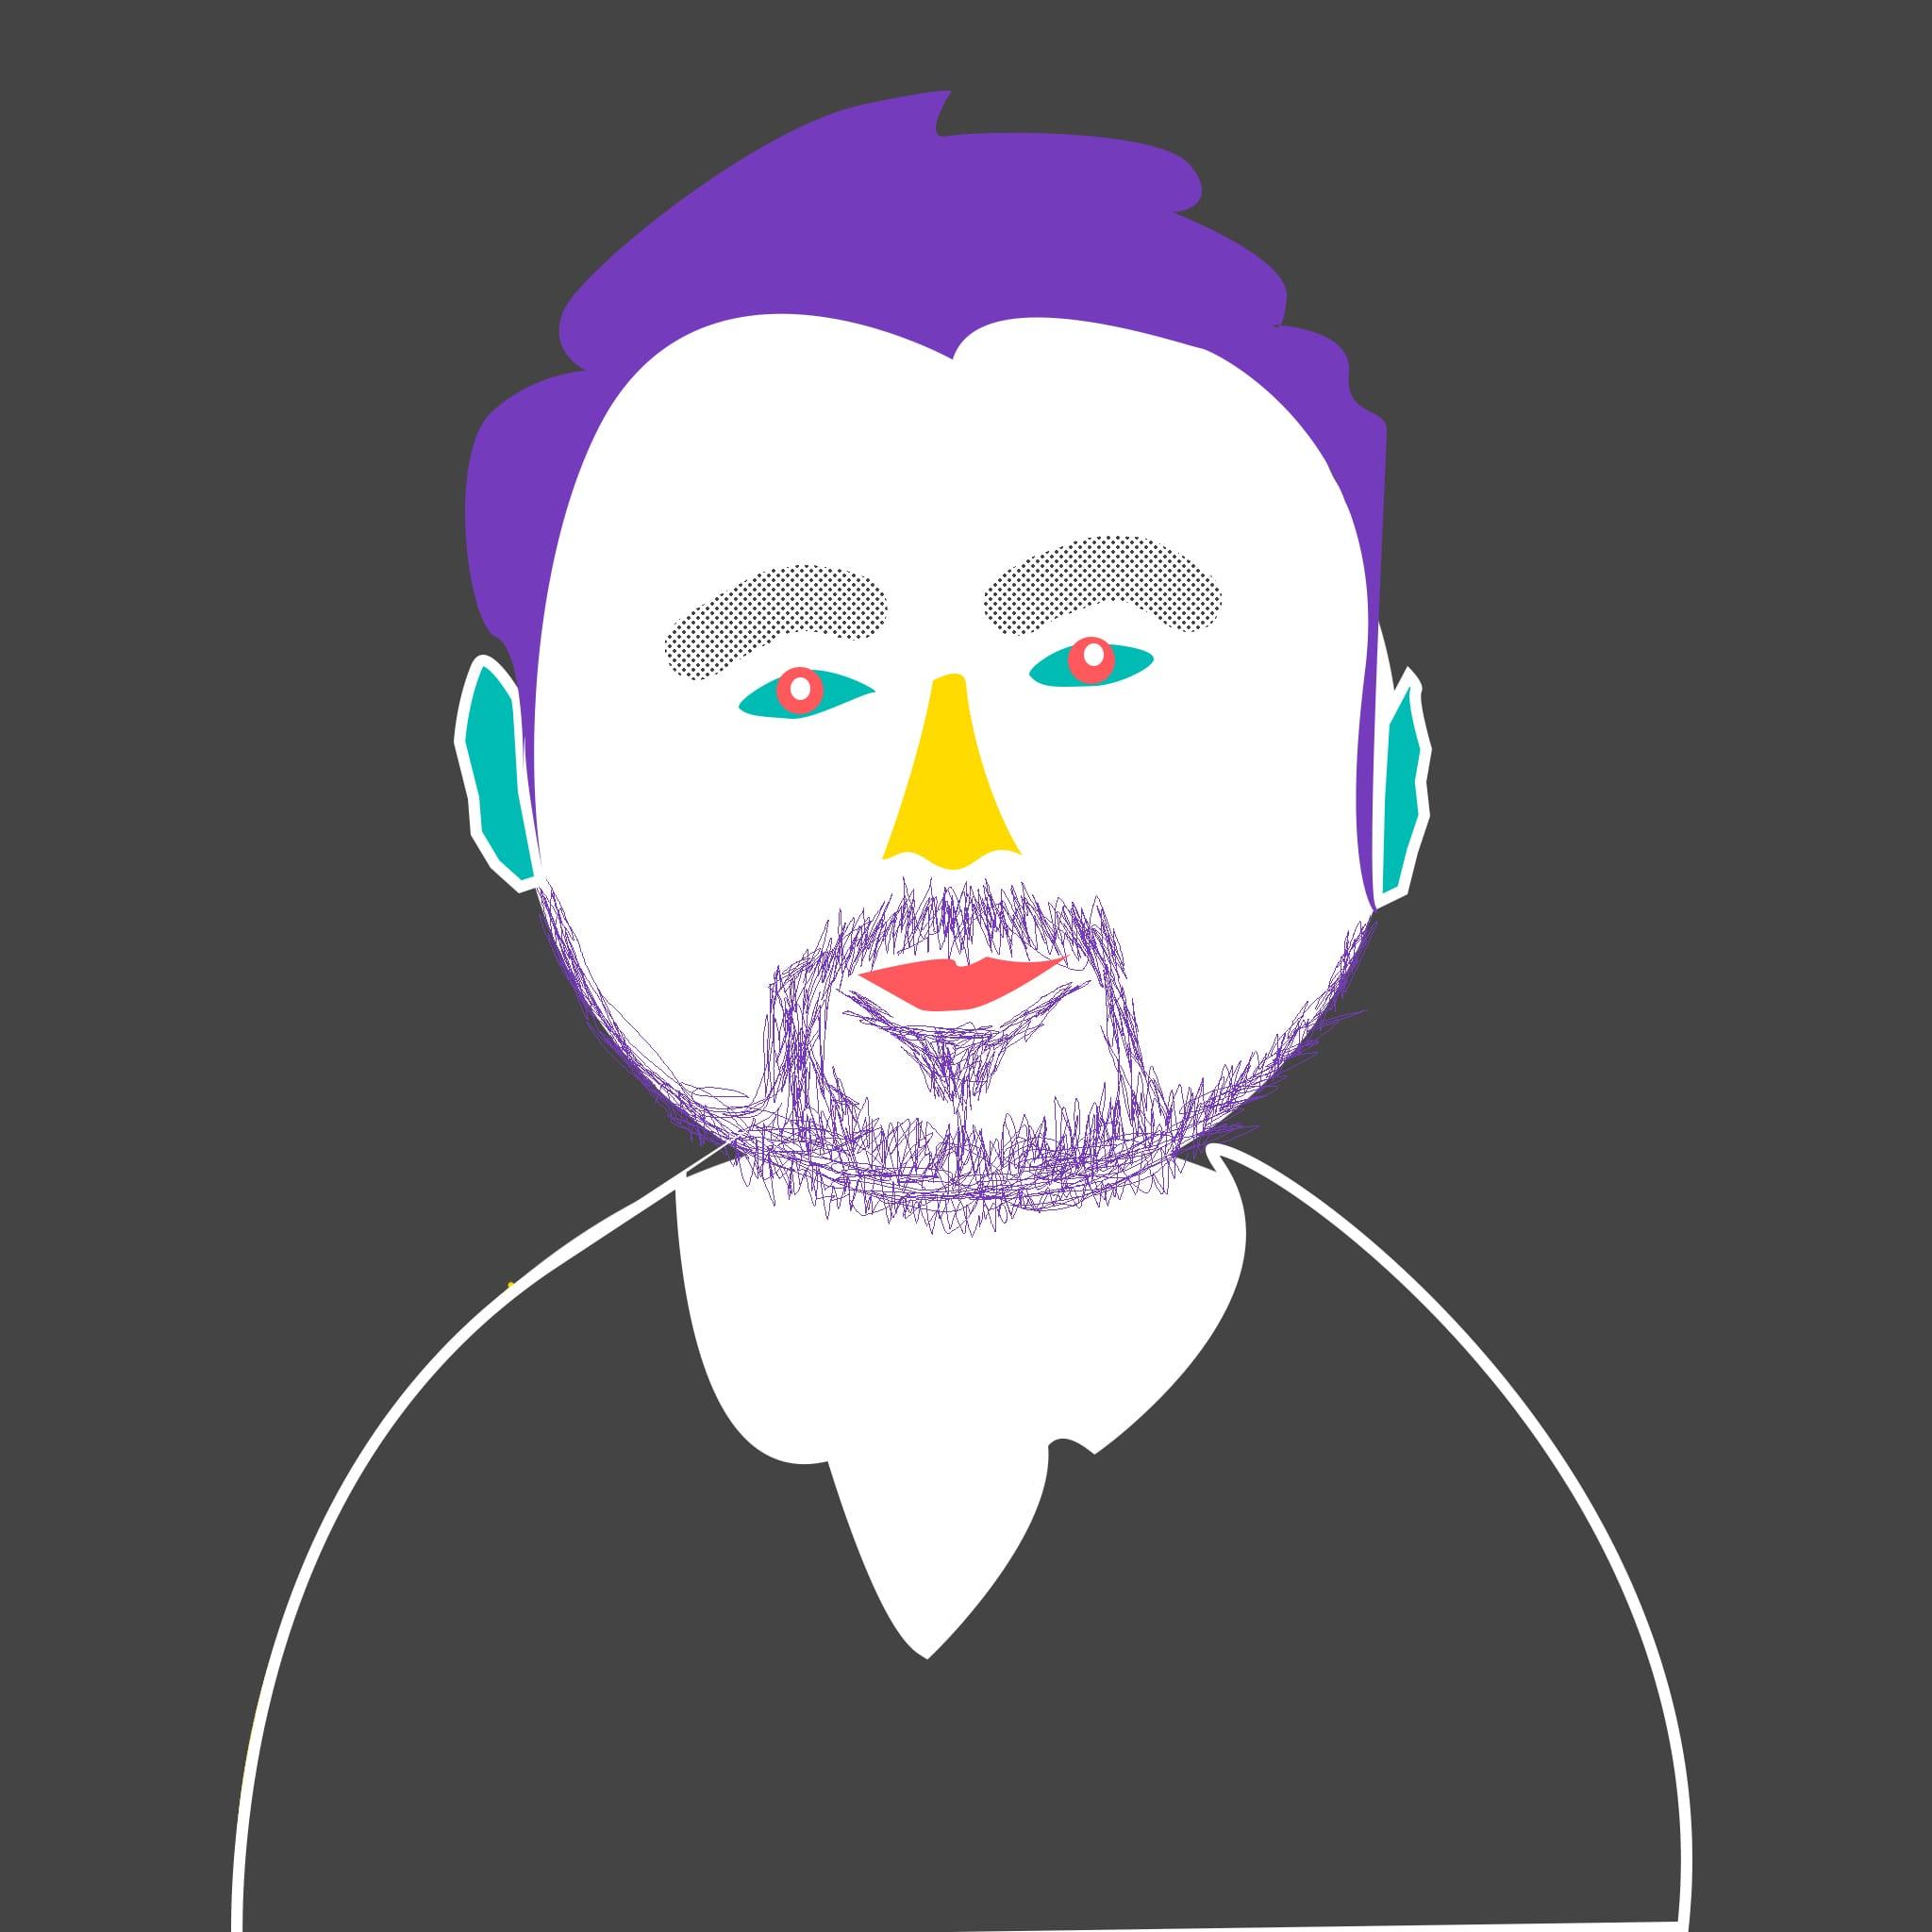 Skyba drawn headshot